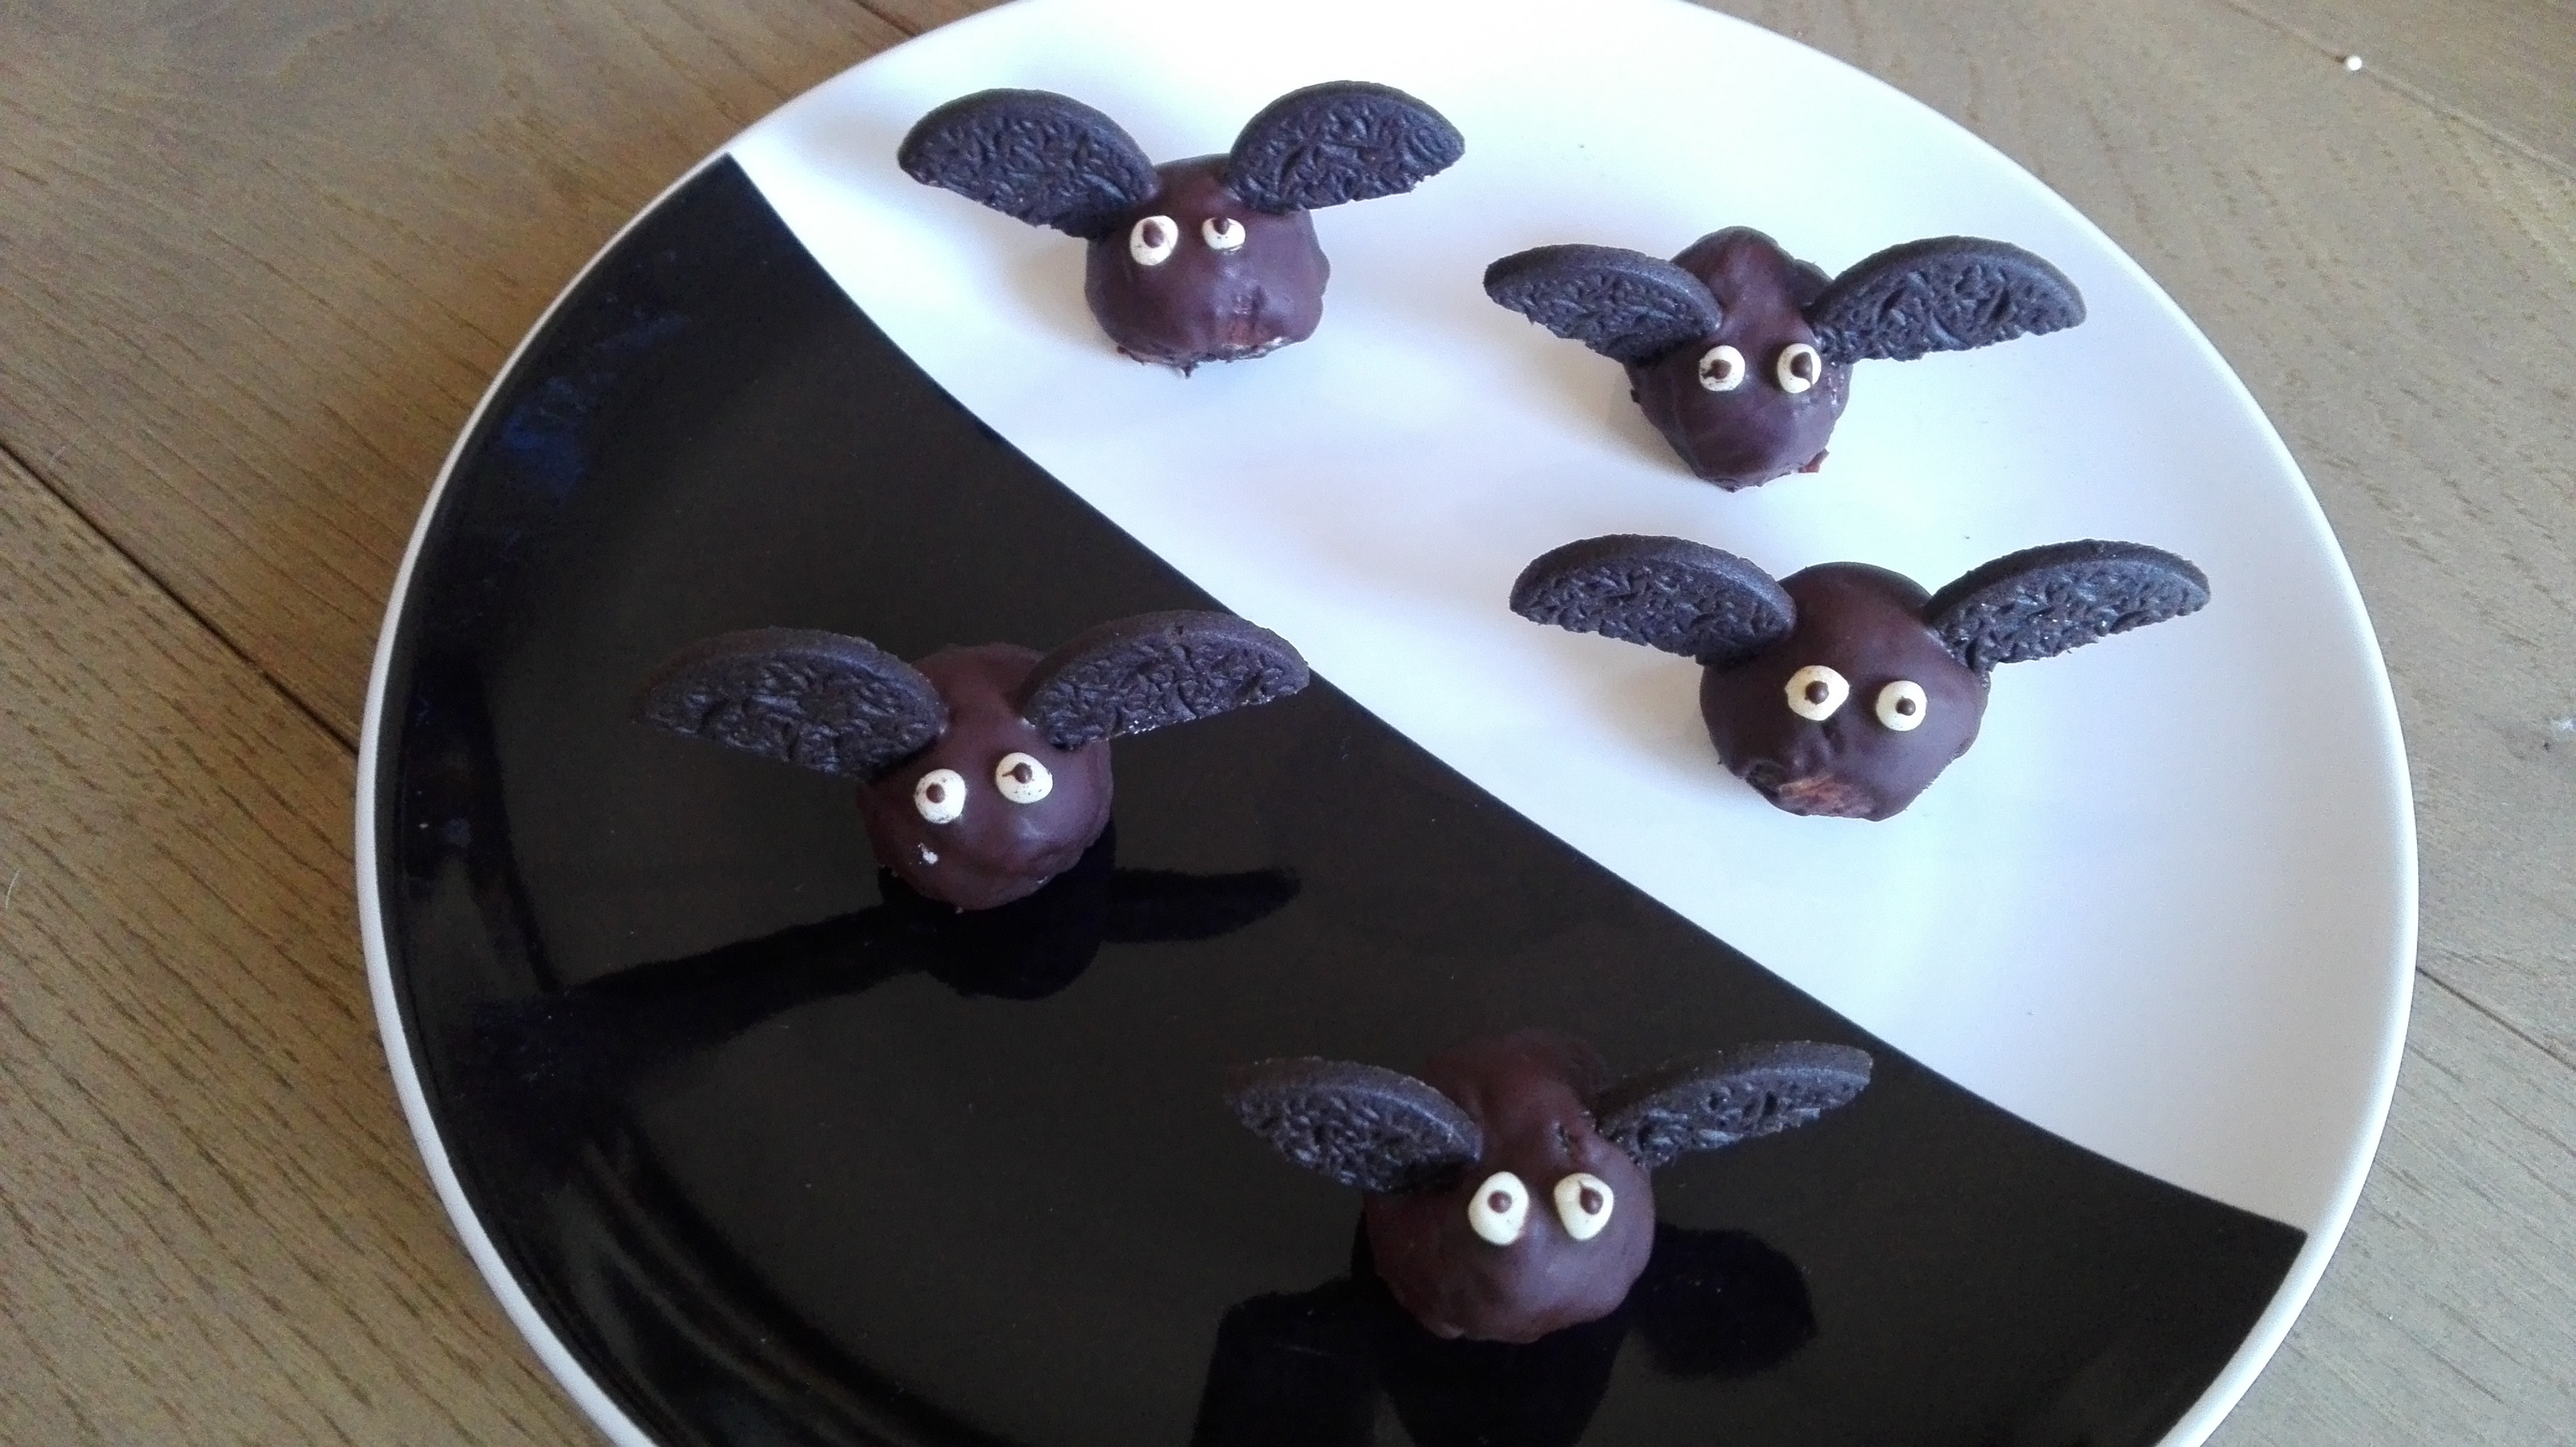 Pipistrelli dolci di Halloween senza glutine - www.gingerglutenfree.com 7d5a97cebf88